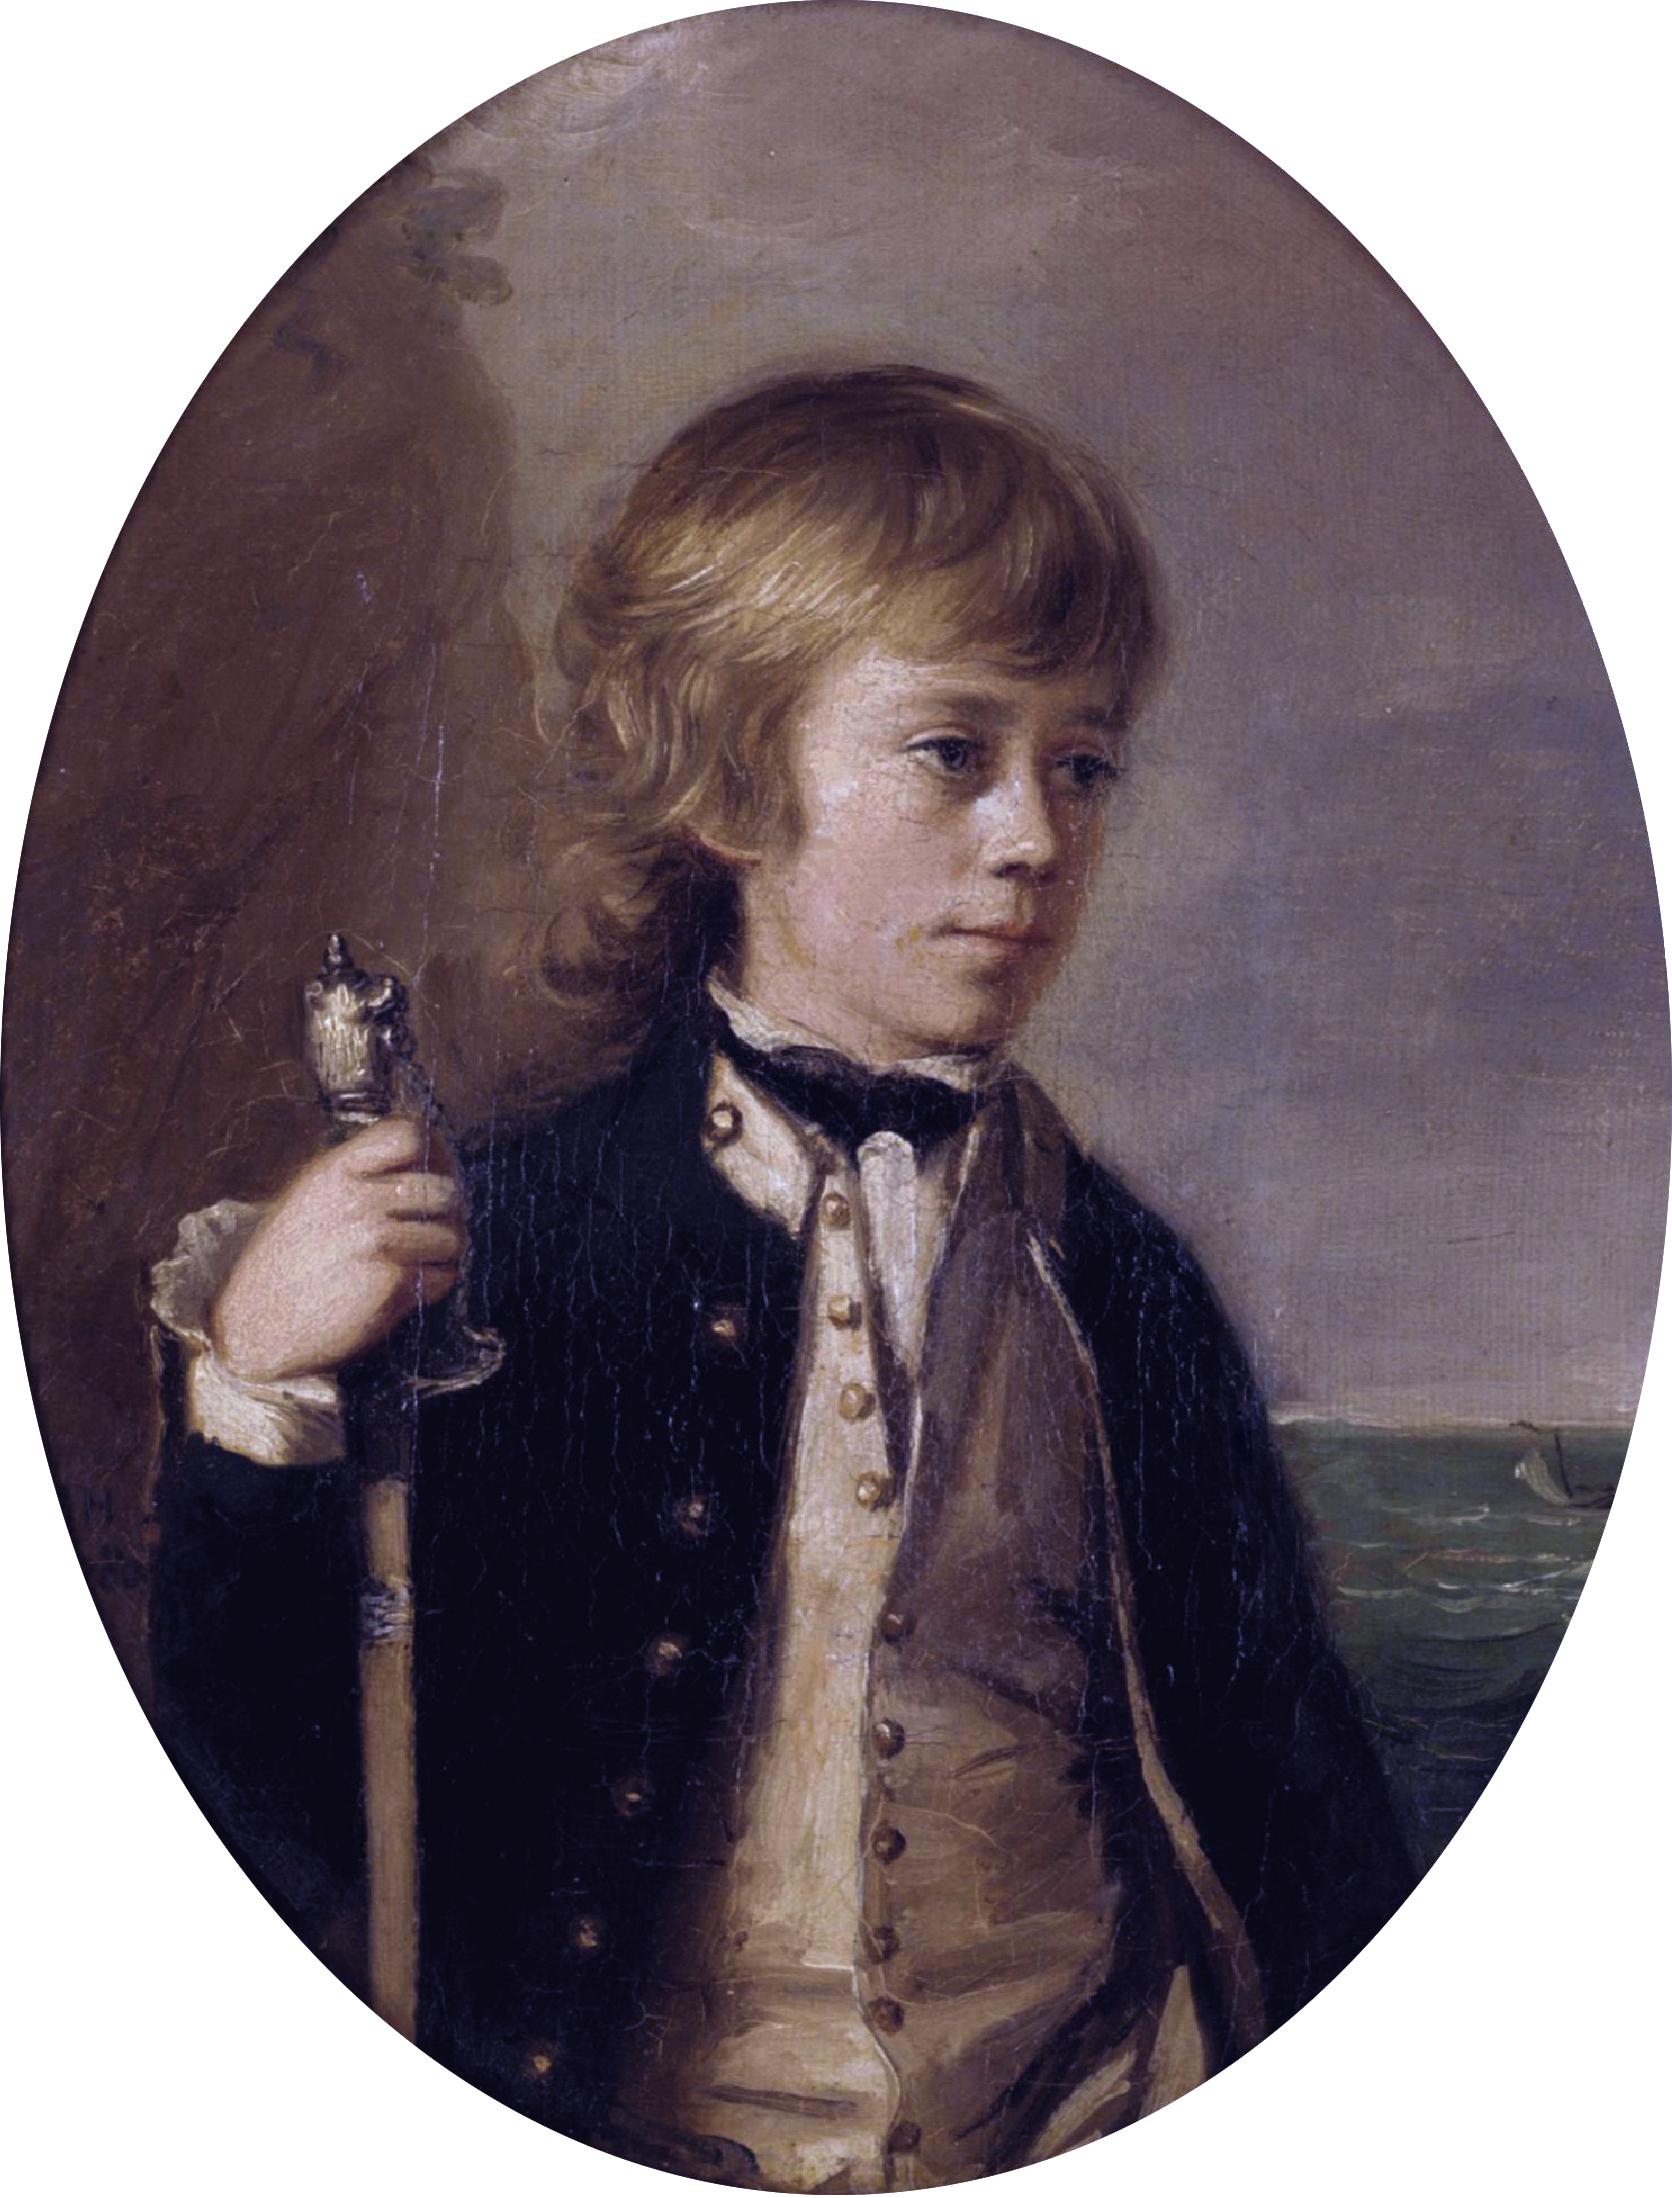 Midshipman Henry William Baynton, aged 13 -1780 - Wikipedia.jpg